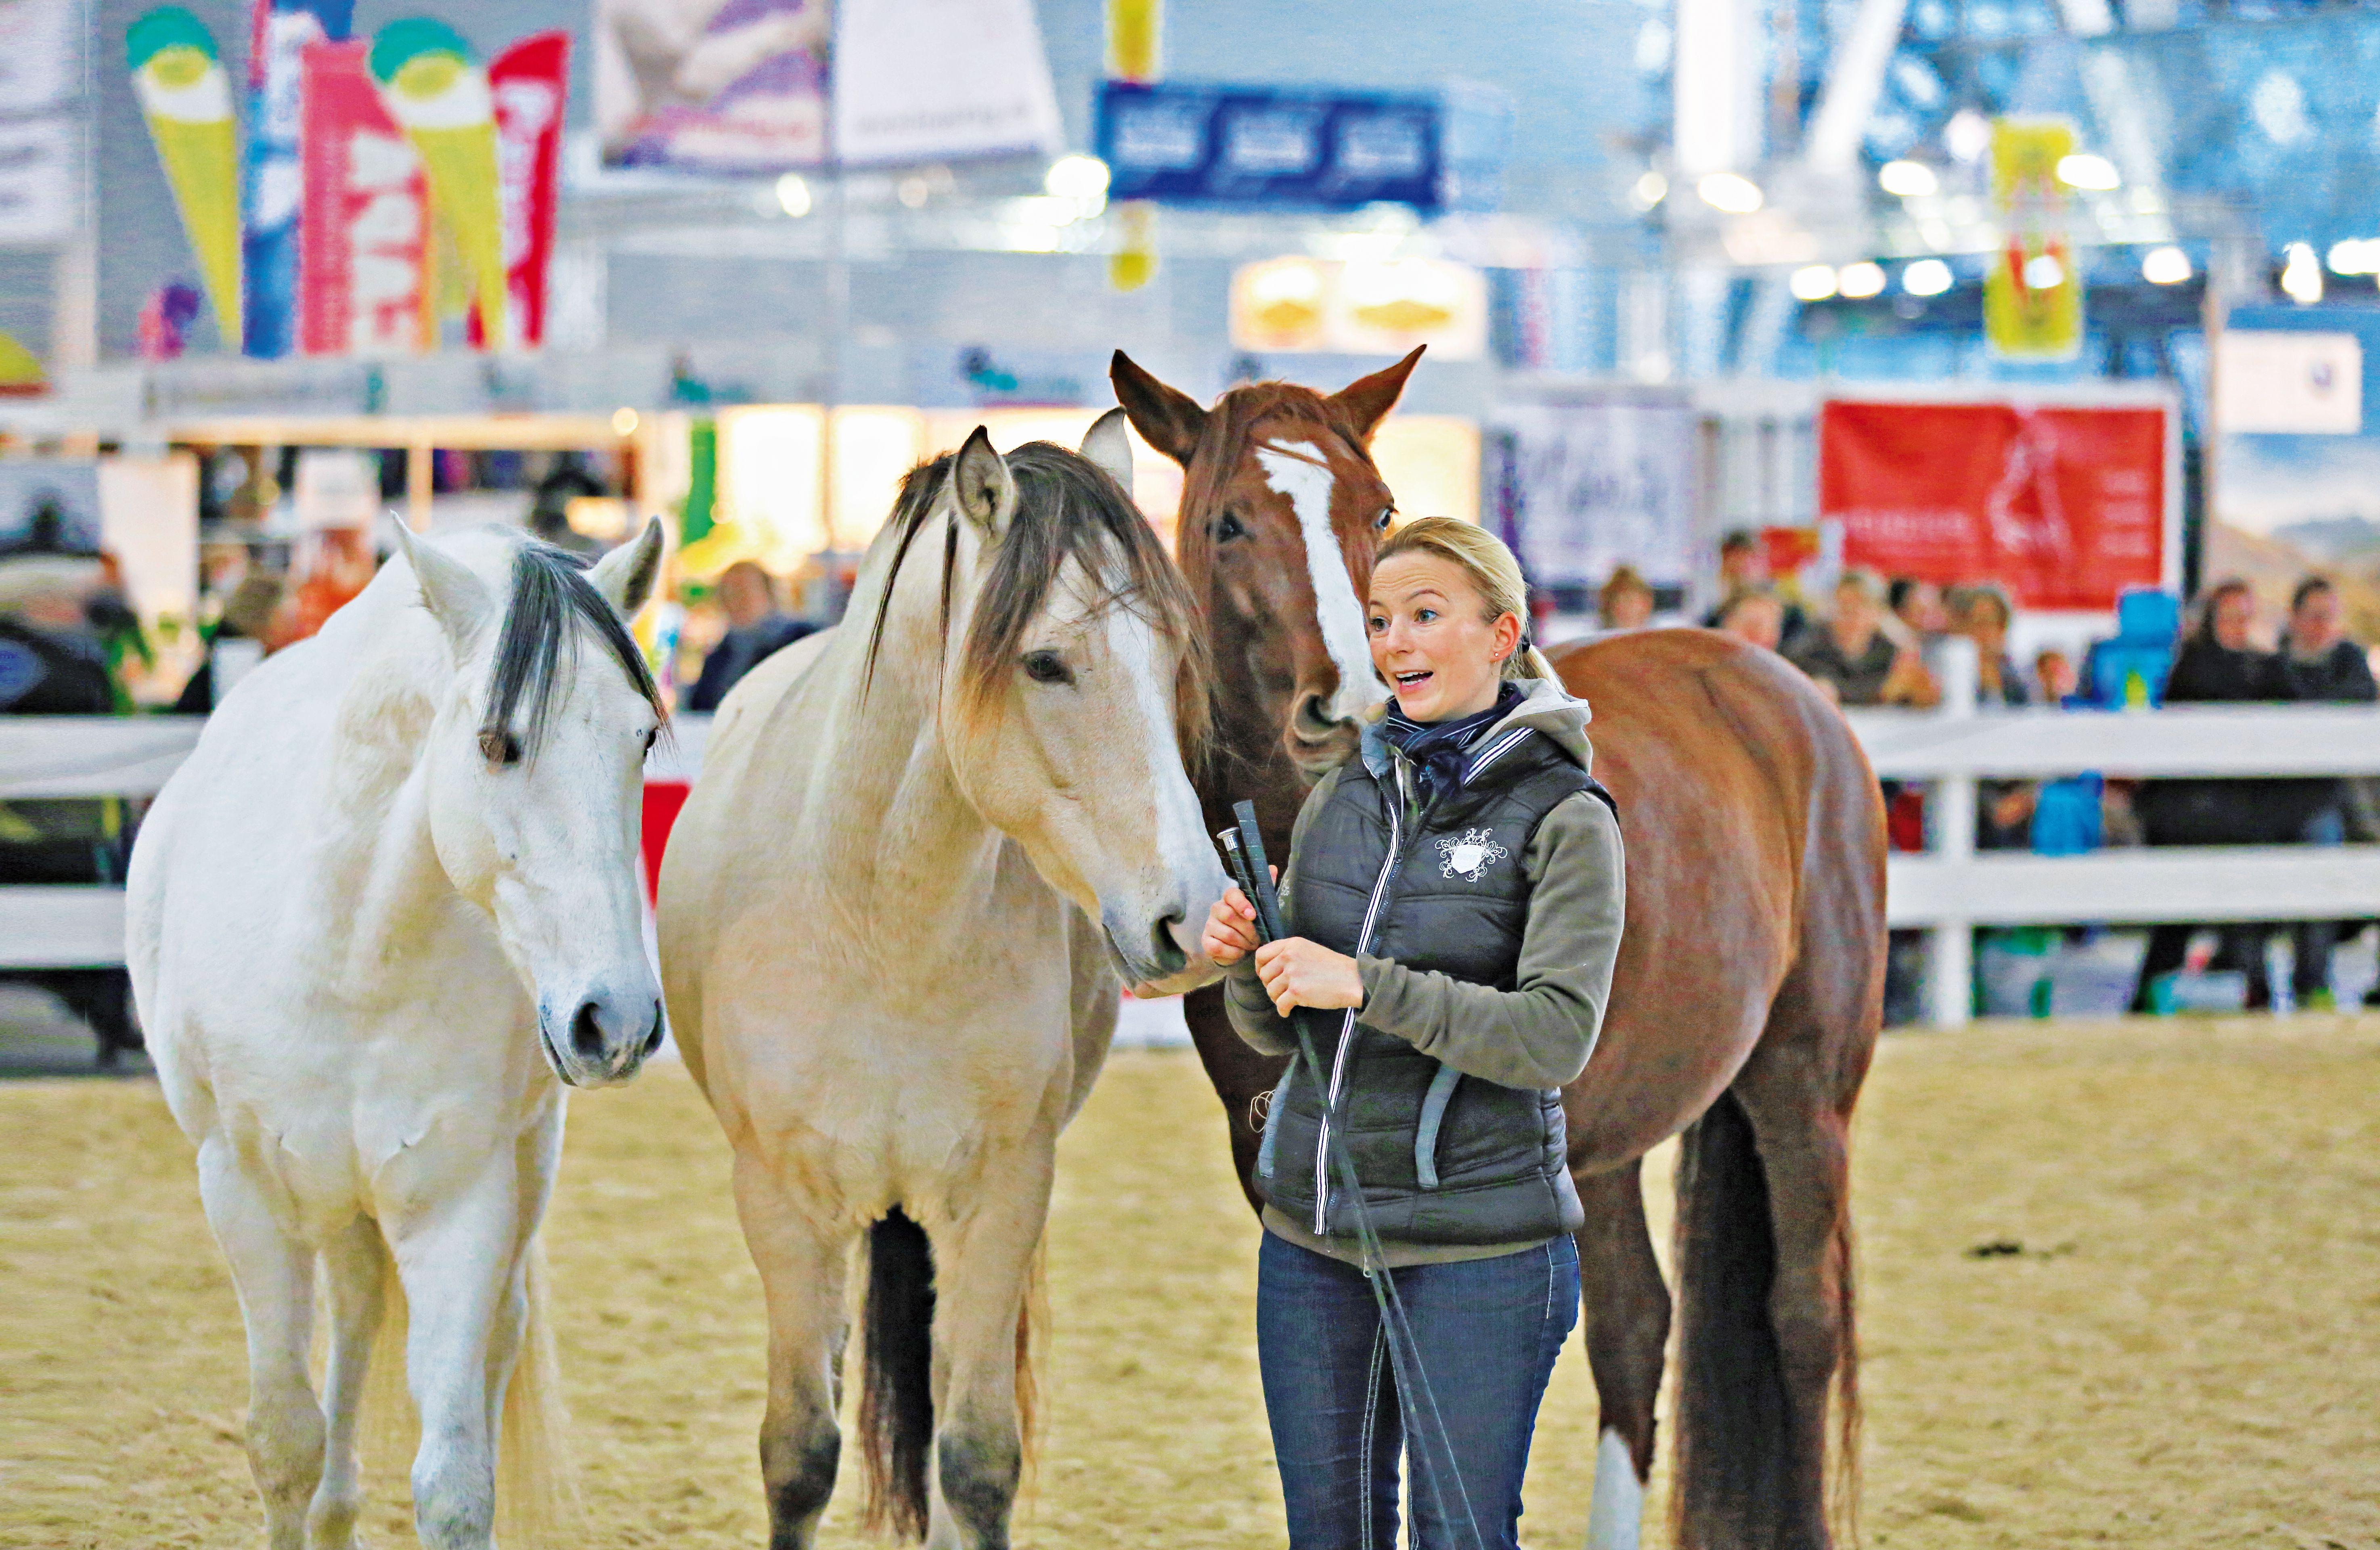 459b51c0754f2 Pferd   Jagd - Messe-Highlight der internationalen Pferdebranche ...